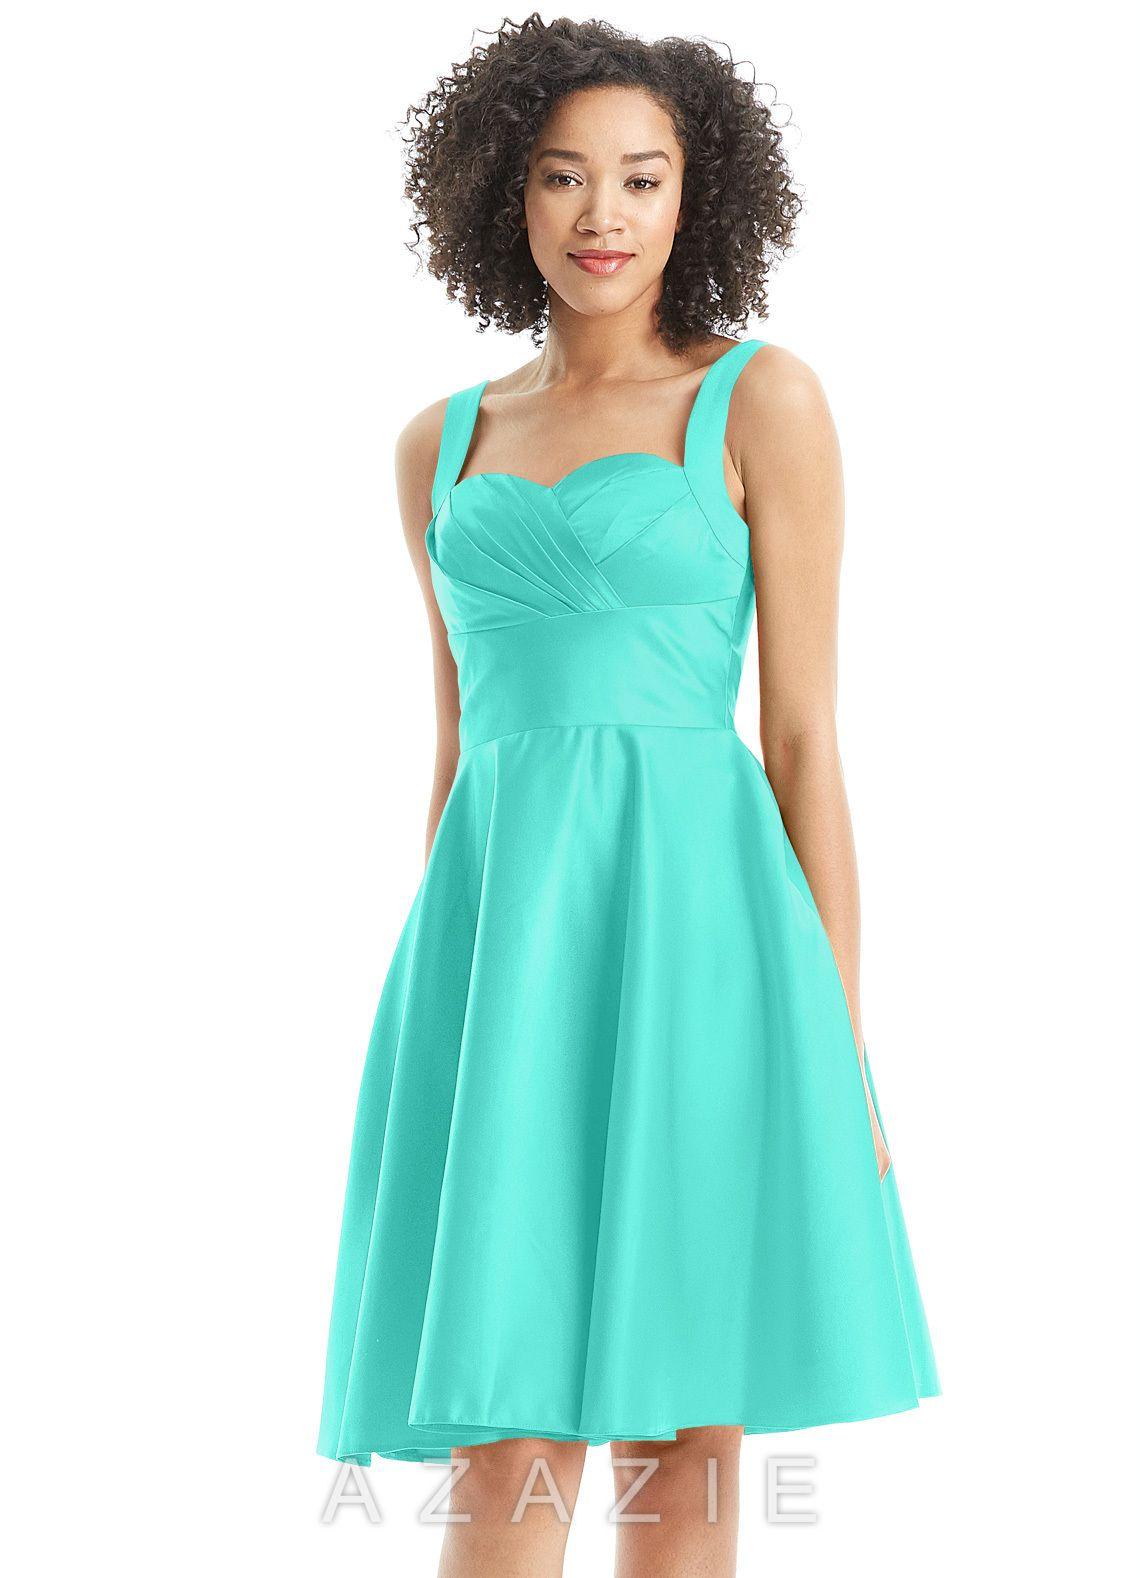 Fantastic Party Dress Ideas Ensign - All Wedding Dresses ...